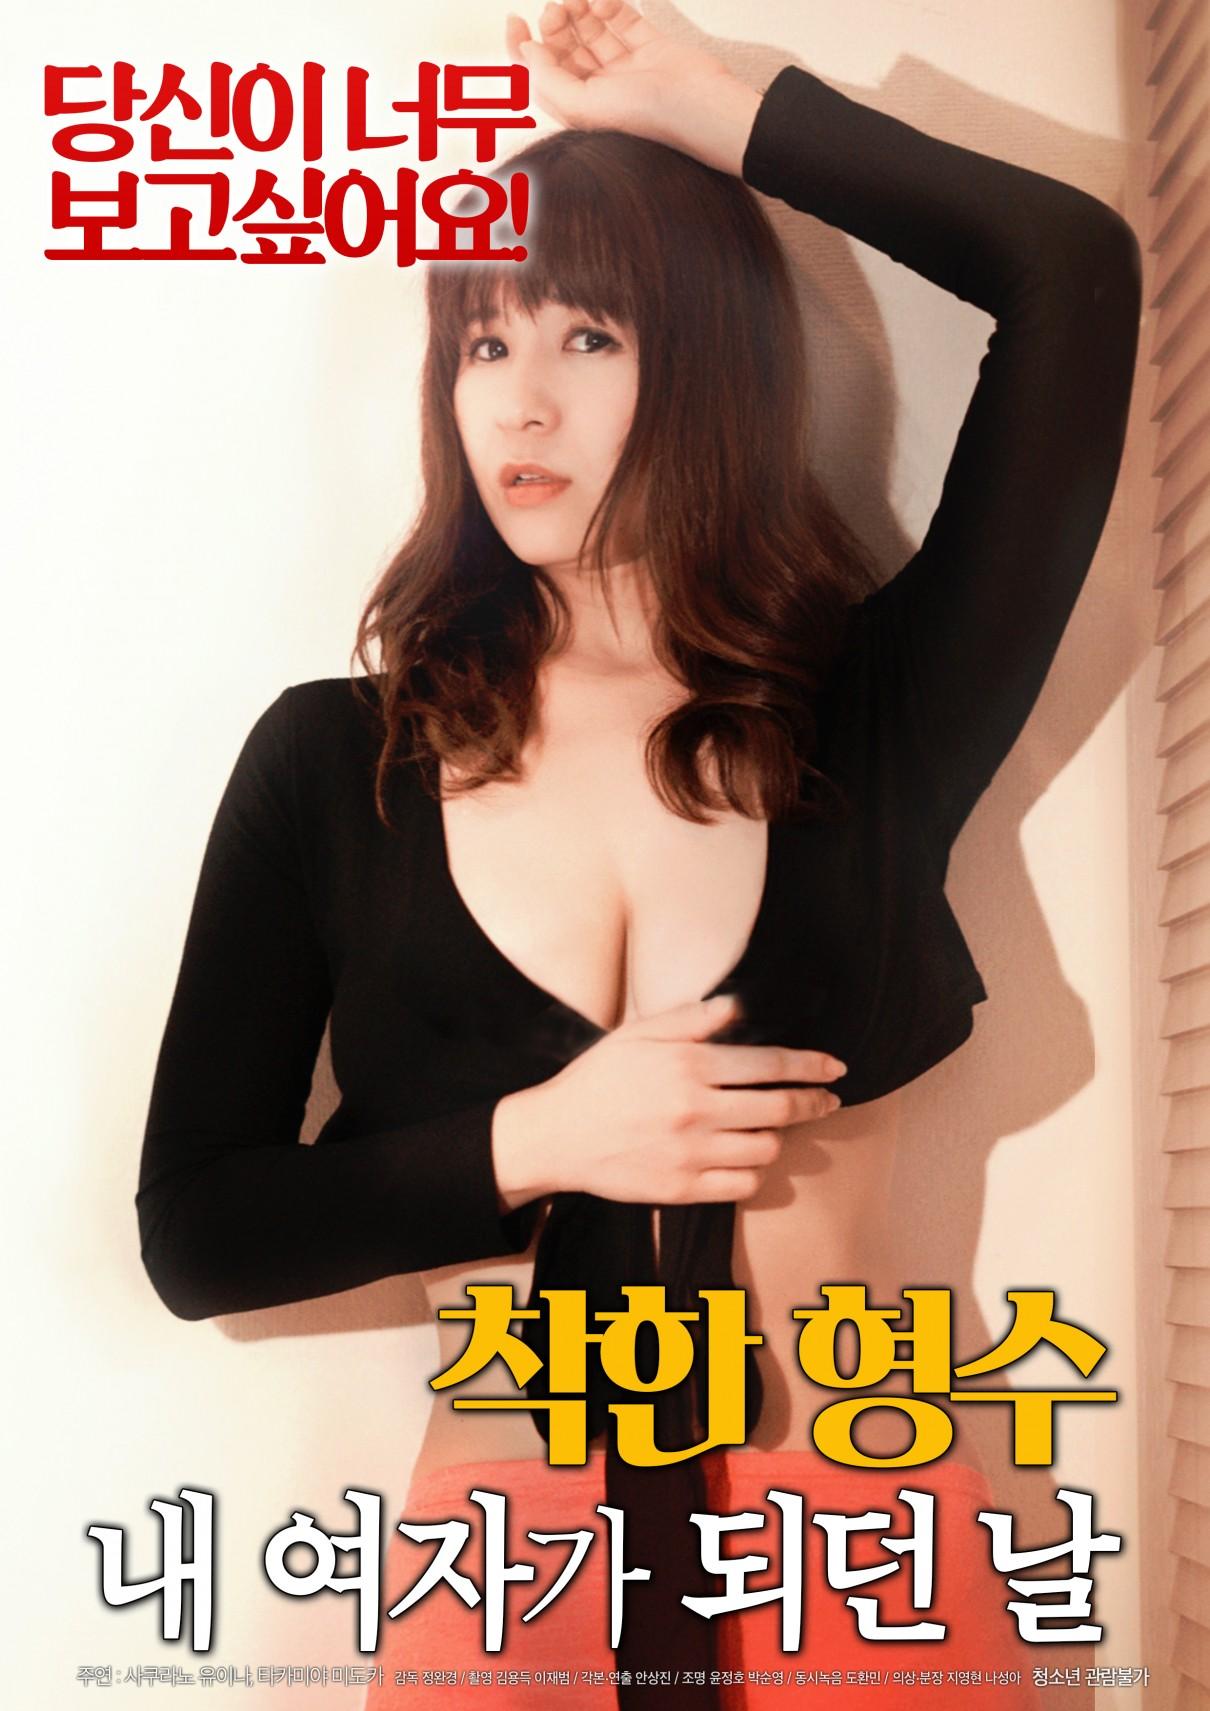 电影《善良的嫂子:成为女人之日 》剧照 www.hanying55.com